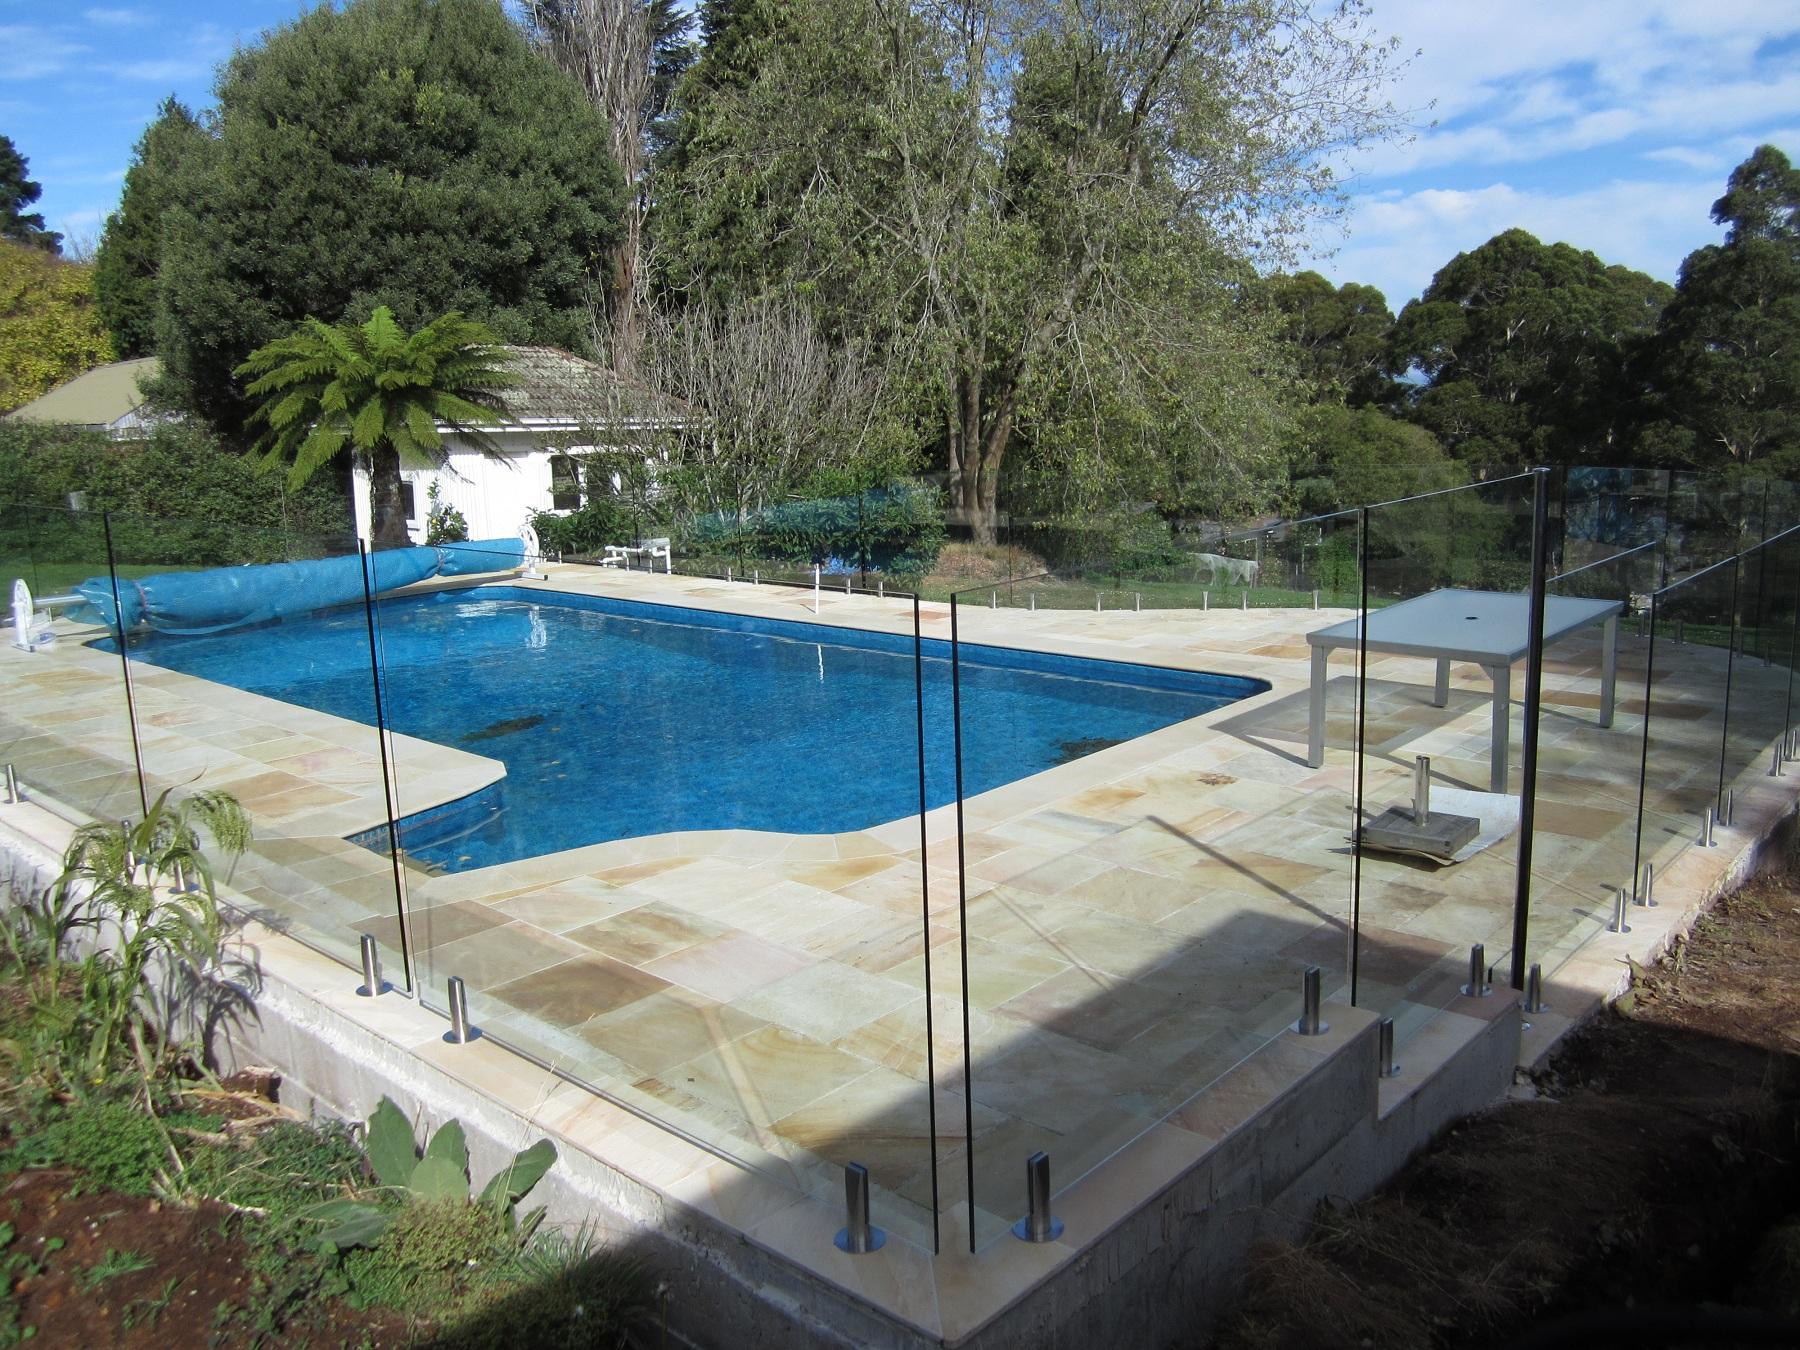 Ferny-Creek-frameless-glass-pool-fencing